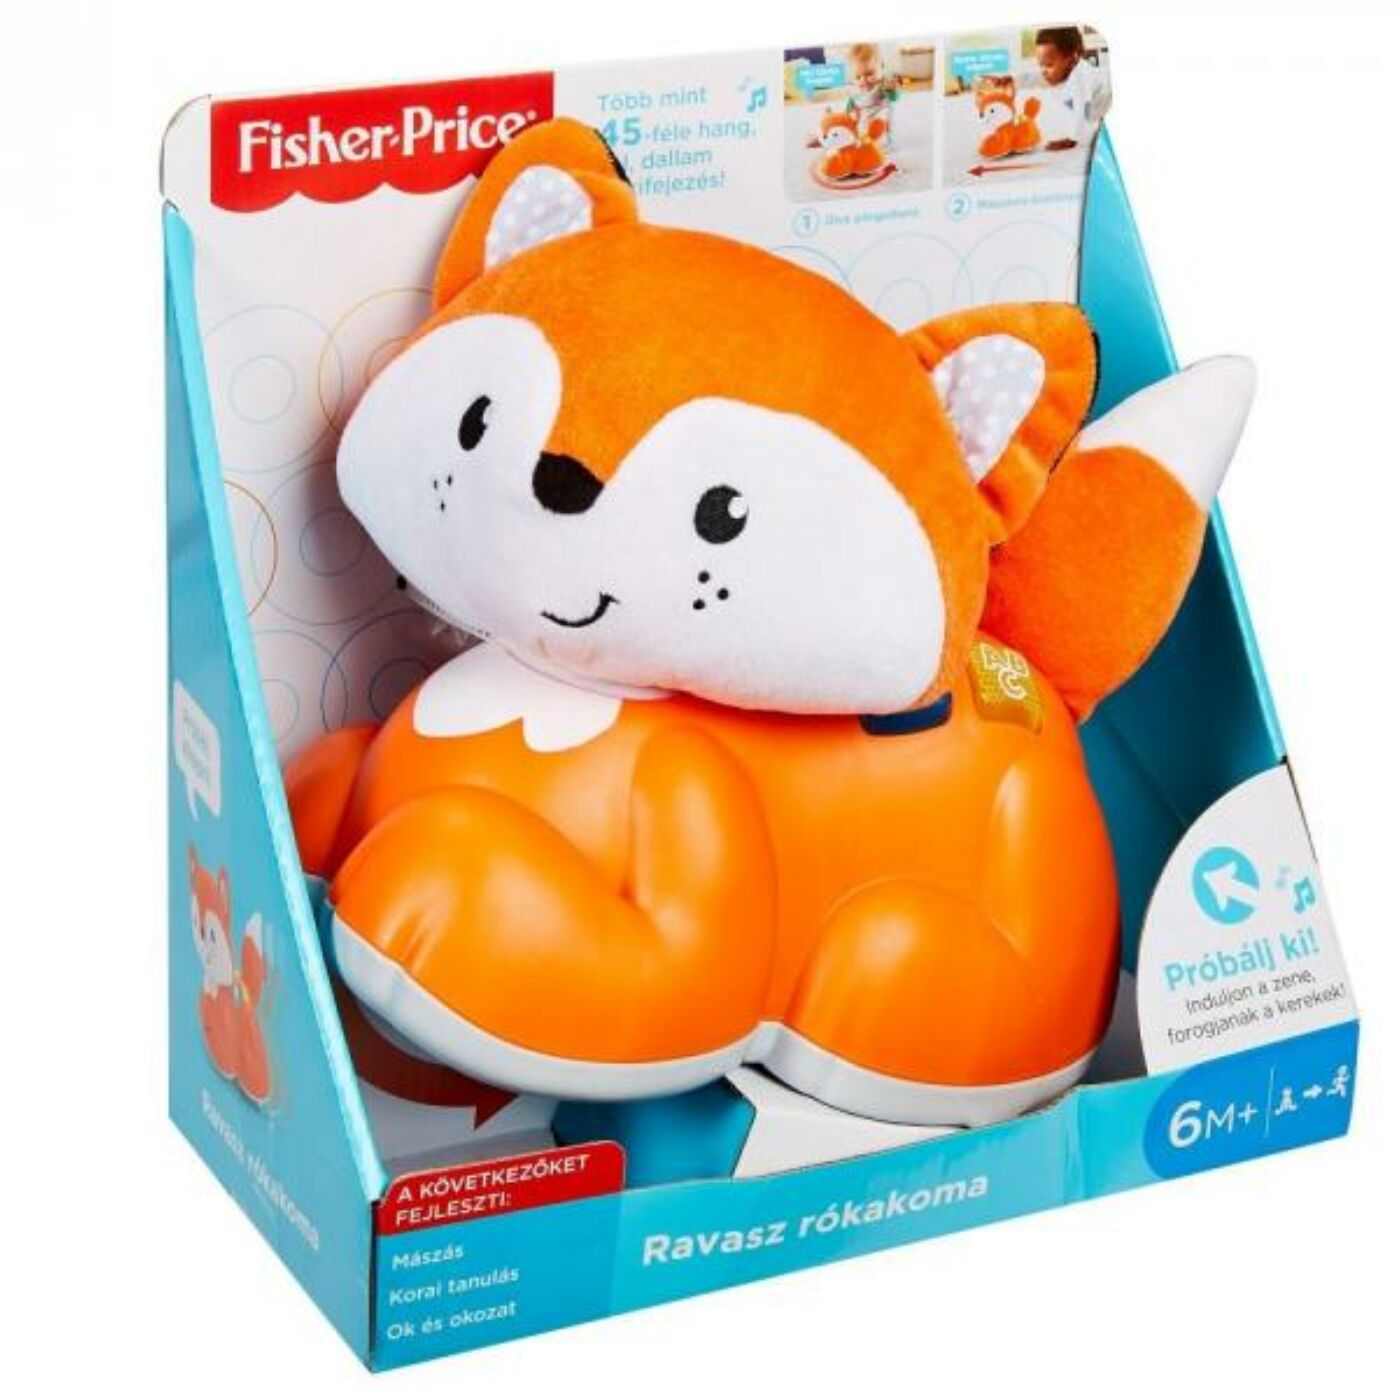 Fisher Price Ravasz rókakoma